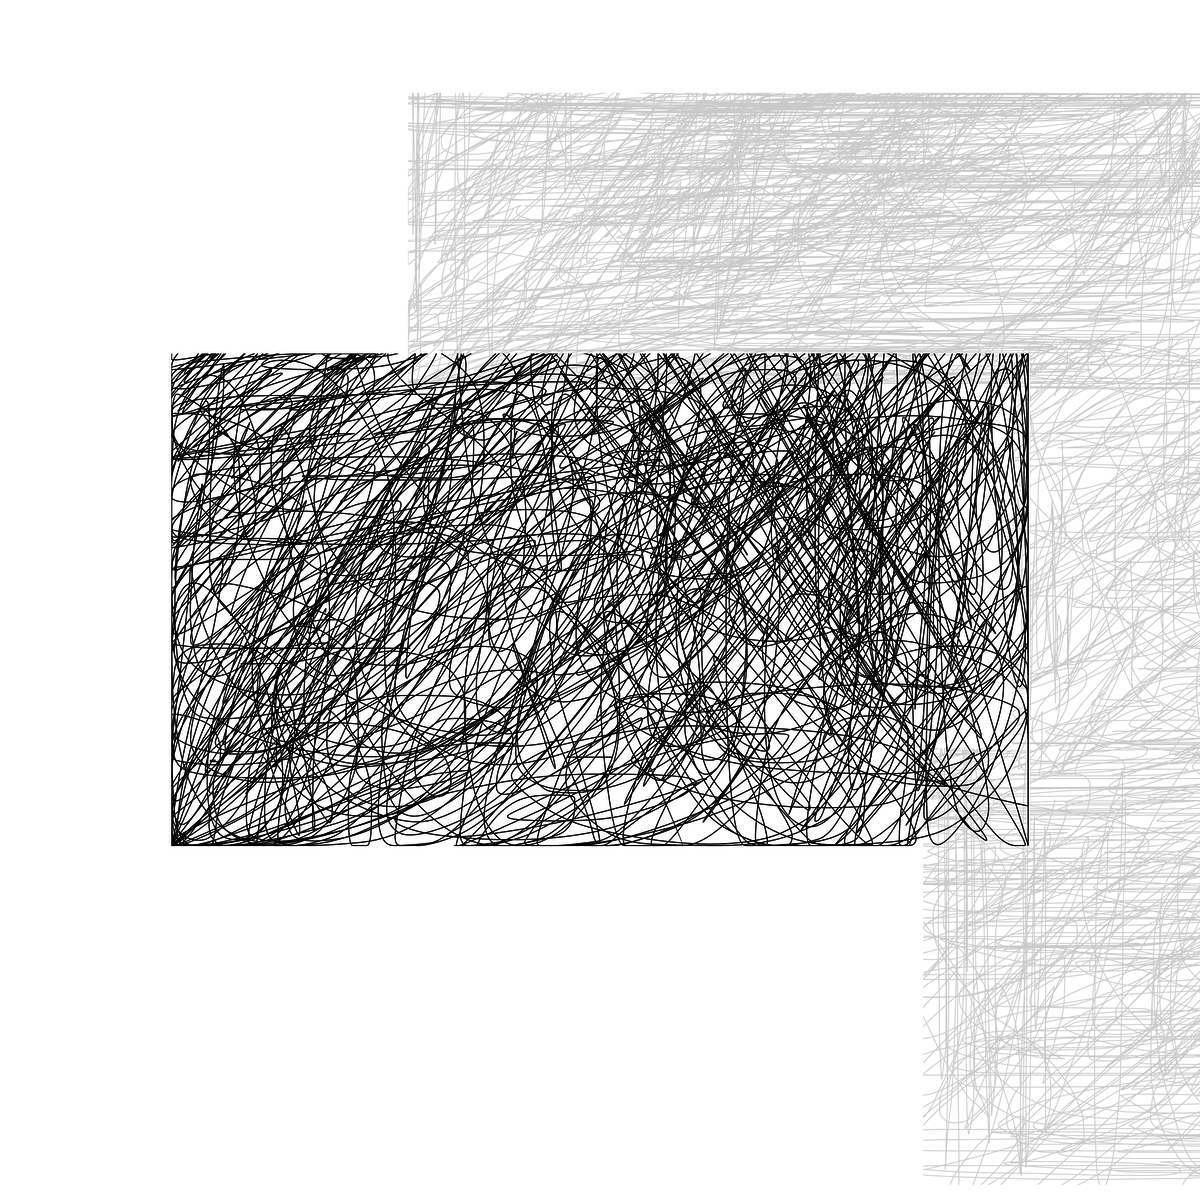 BAAAM drawing#23382 lat:46.5208663940429700lng: 6.6337780952453610